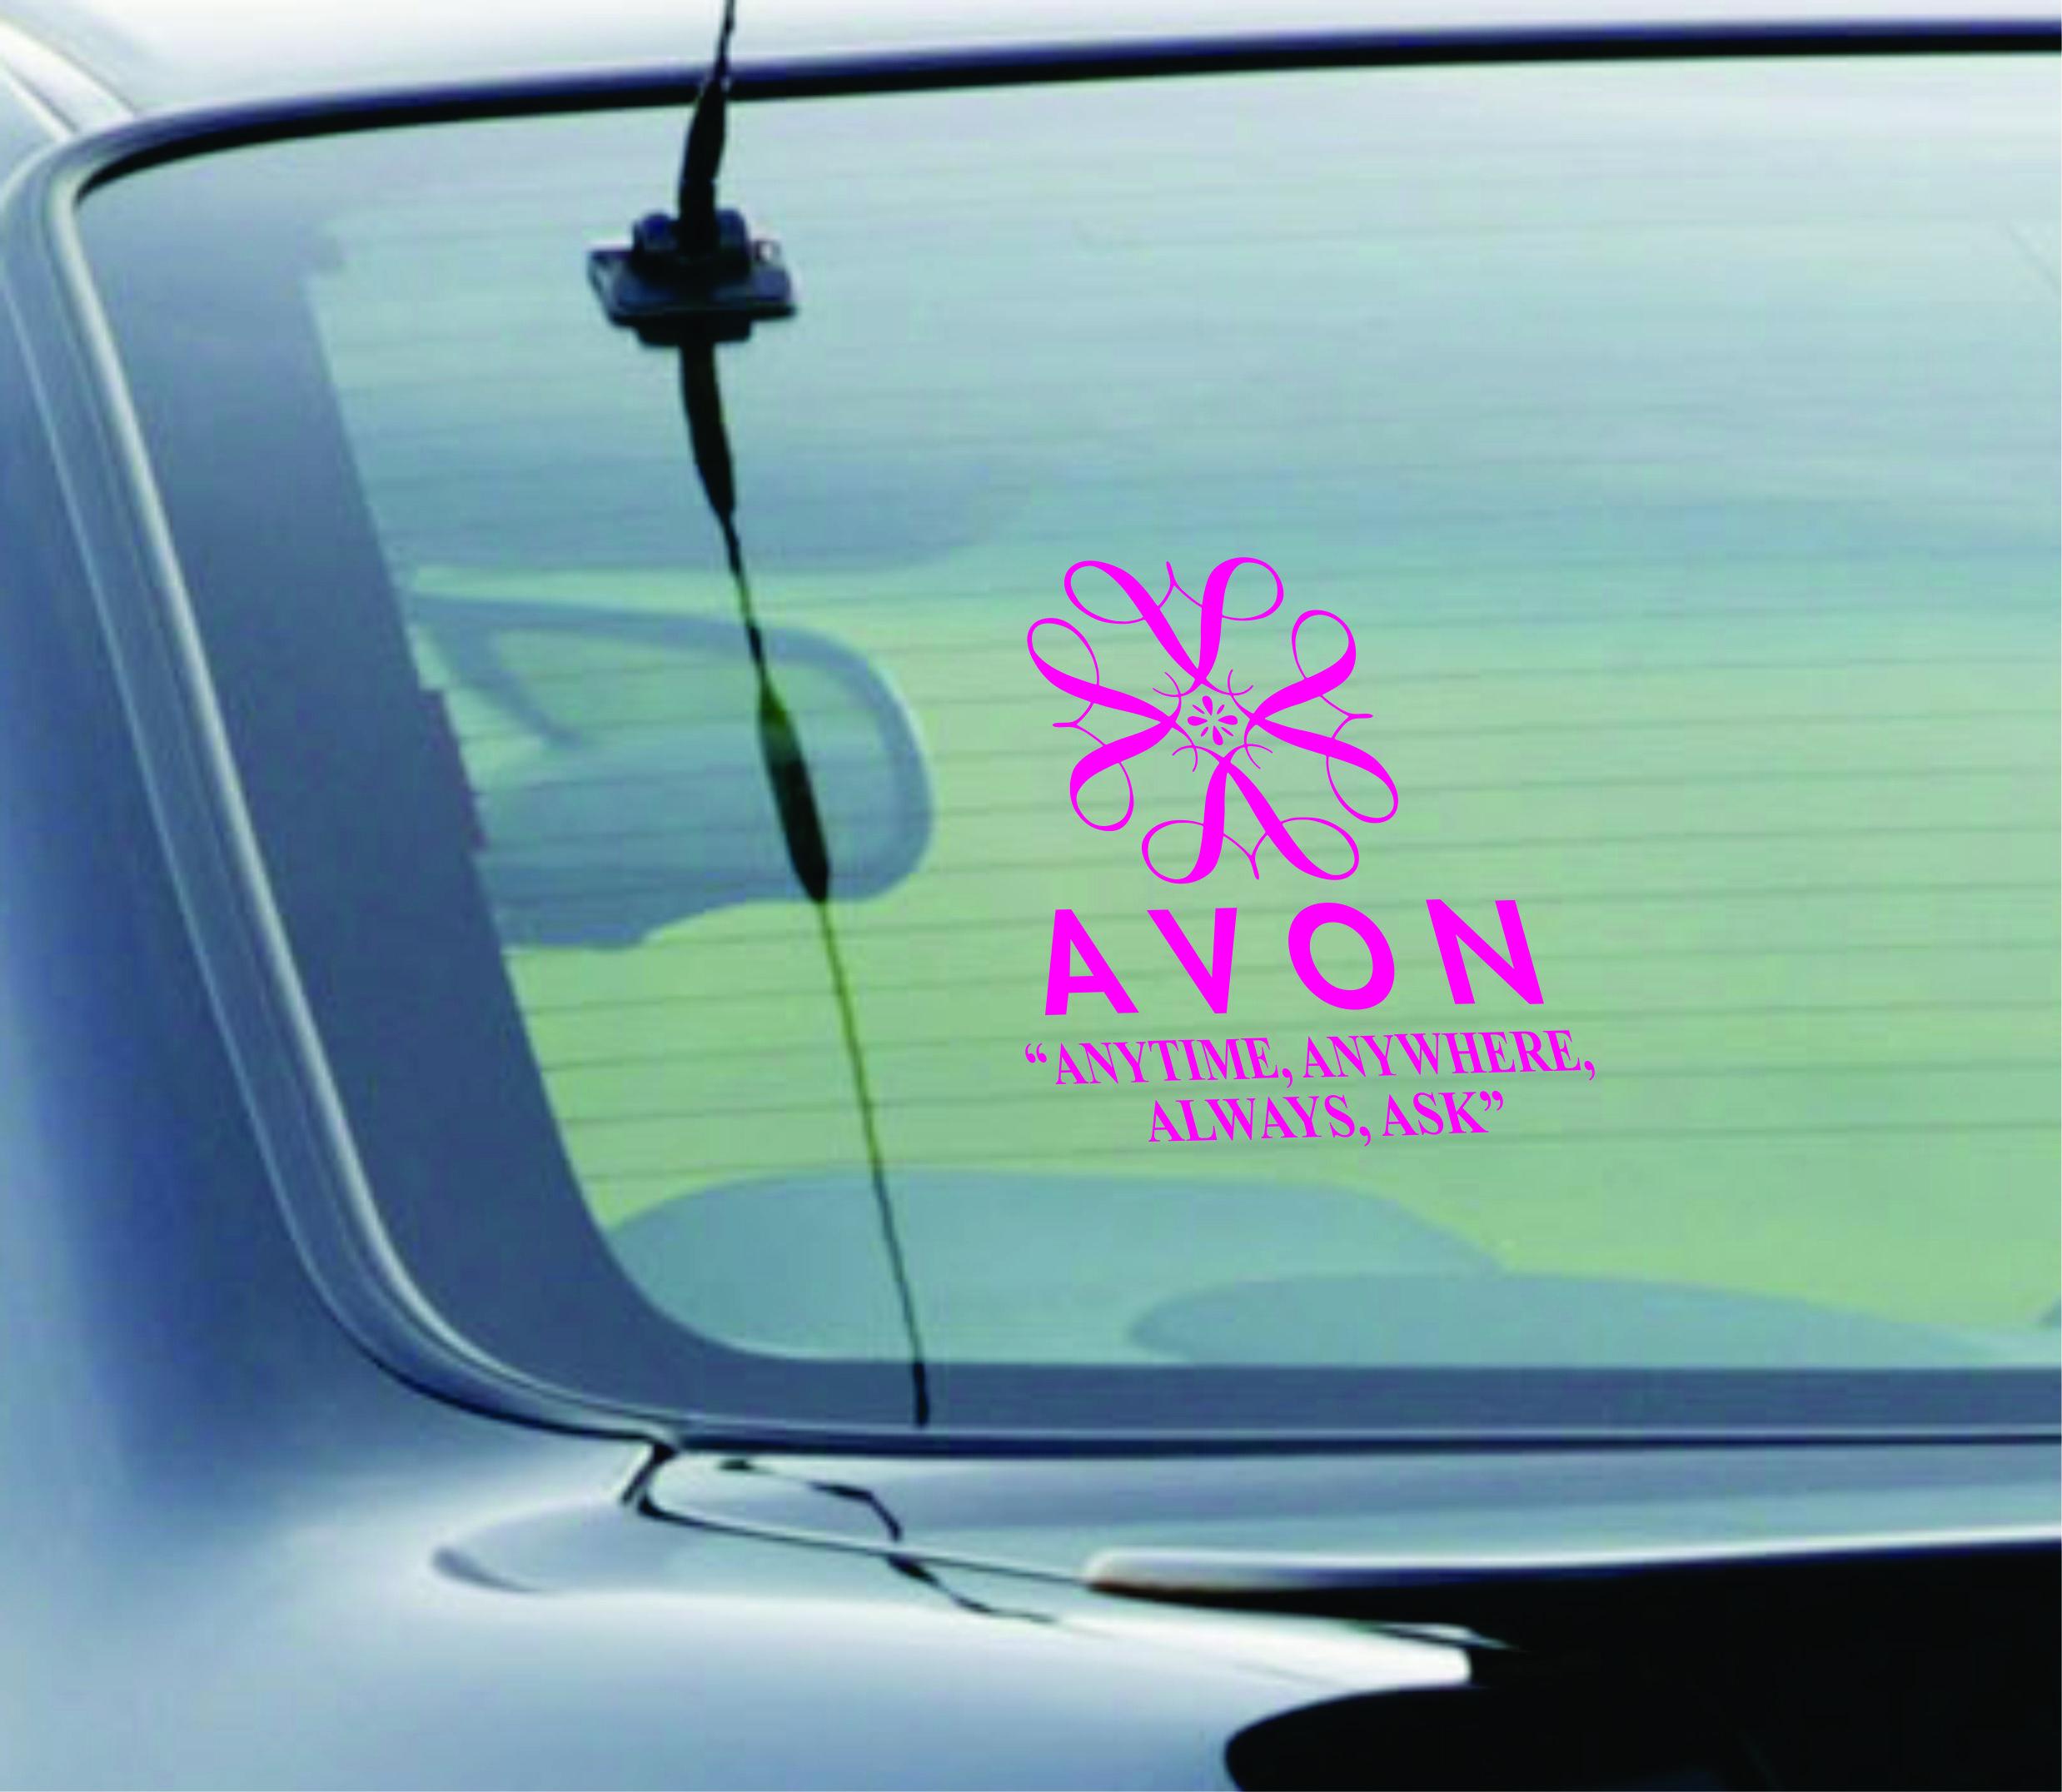 Here Is A New Avon Window Decal Of Avon S Iconic 4a Logo Avon Window Decal Are 5 Each Or 10 Each If Customized Plus Shipping Avon Marketing Avon Logo Avon [ 2152 x 2476 Pixel ]